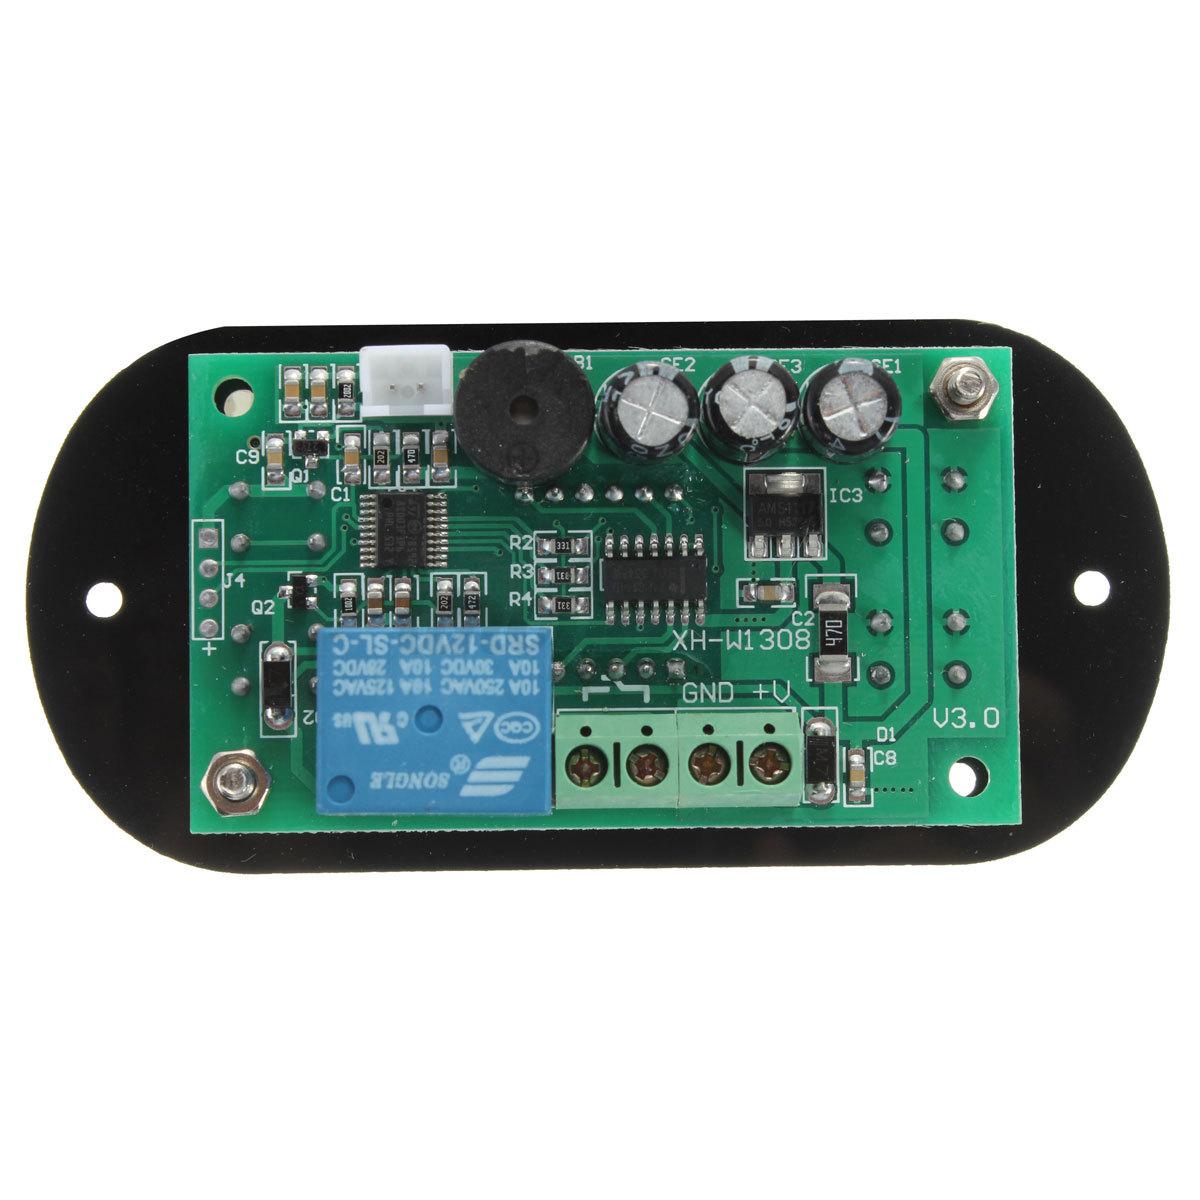 Heat Cool Digital Thermostat Temperature Controller Alarm Sensor Meter #28A378